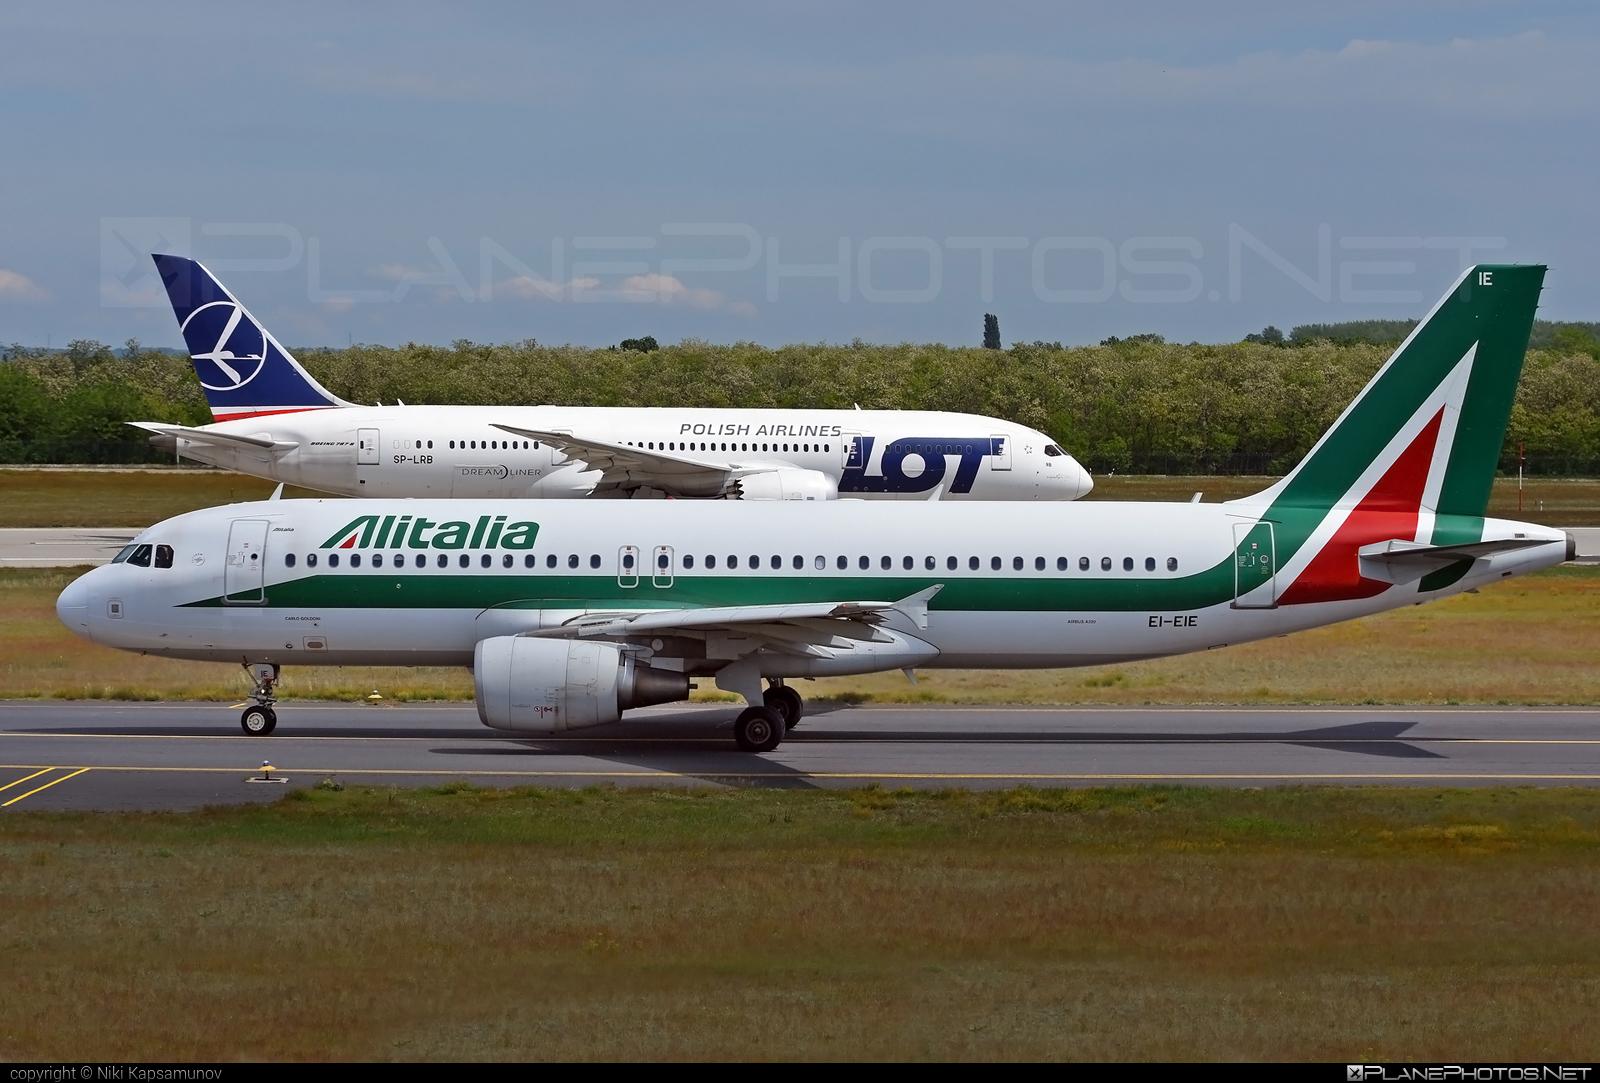 Airbus A320-216 - EI-EIE operated by Alitalia #a320 #a320family #airbus #airbus320 #alitalia